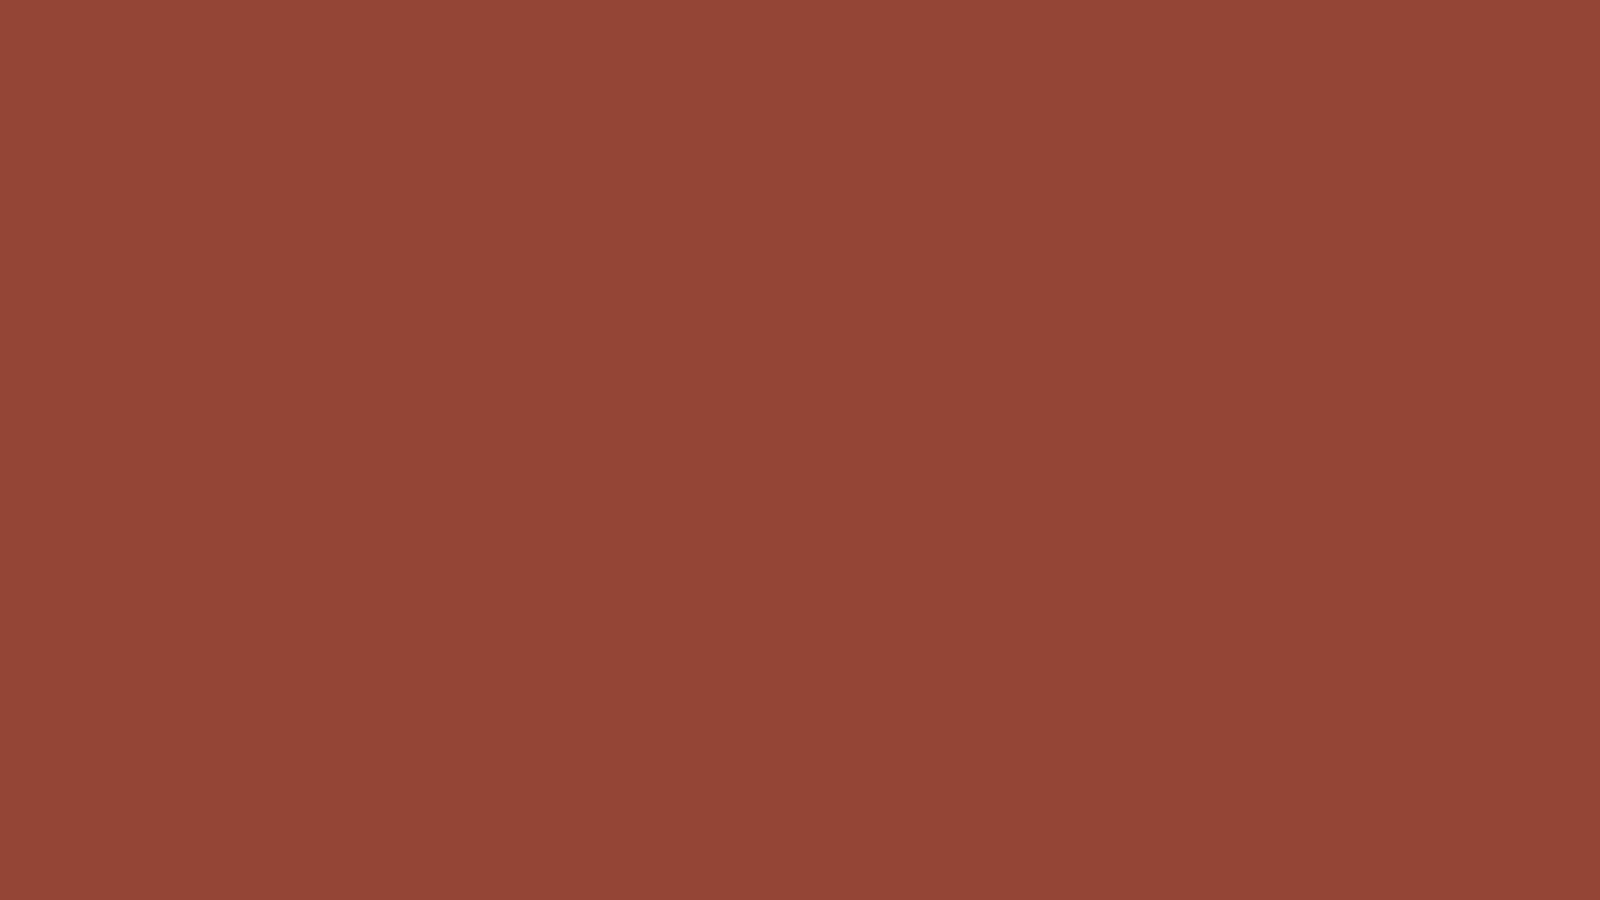 1600x900 Chestnut Solid Color Background